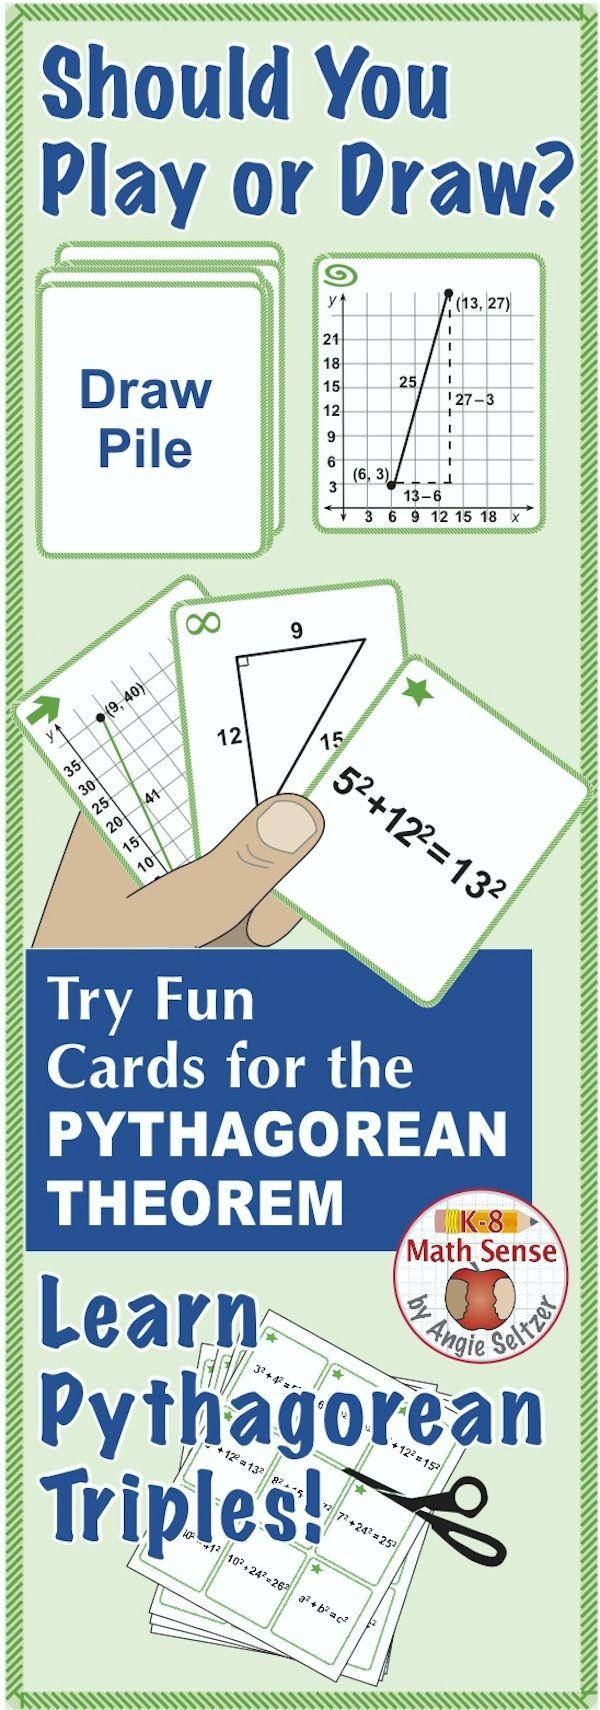 13 best Pitágoras images on Pinterest | Pythagorean theorem ...